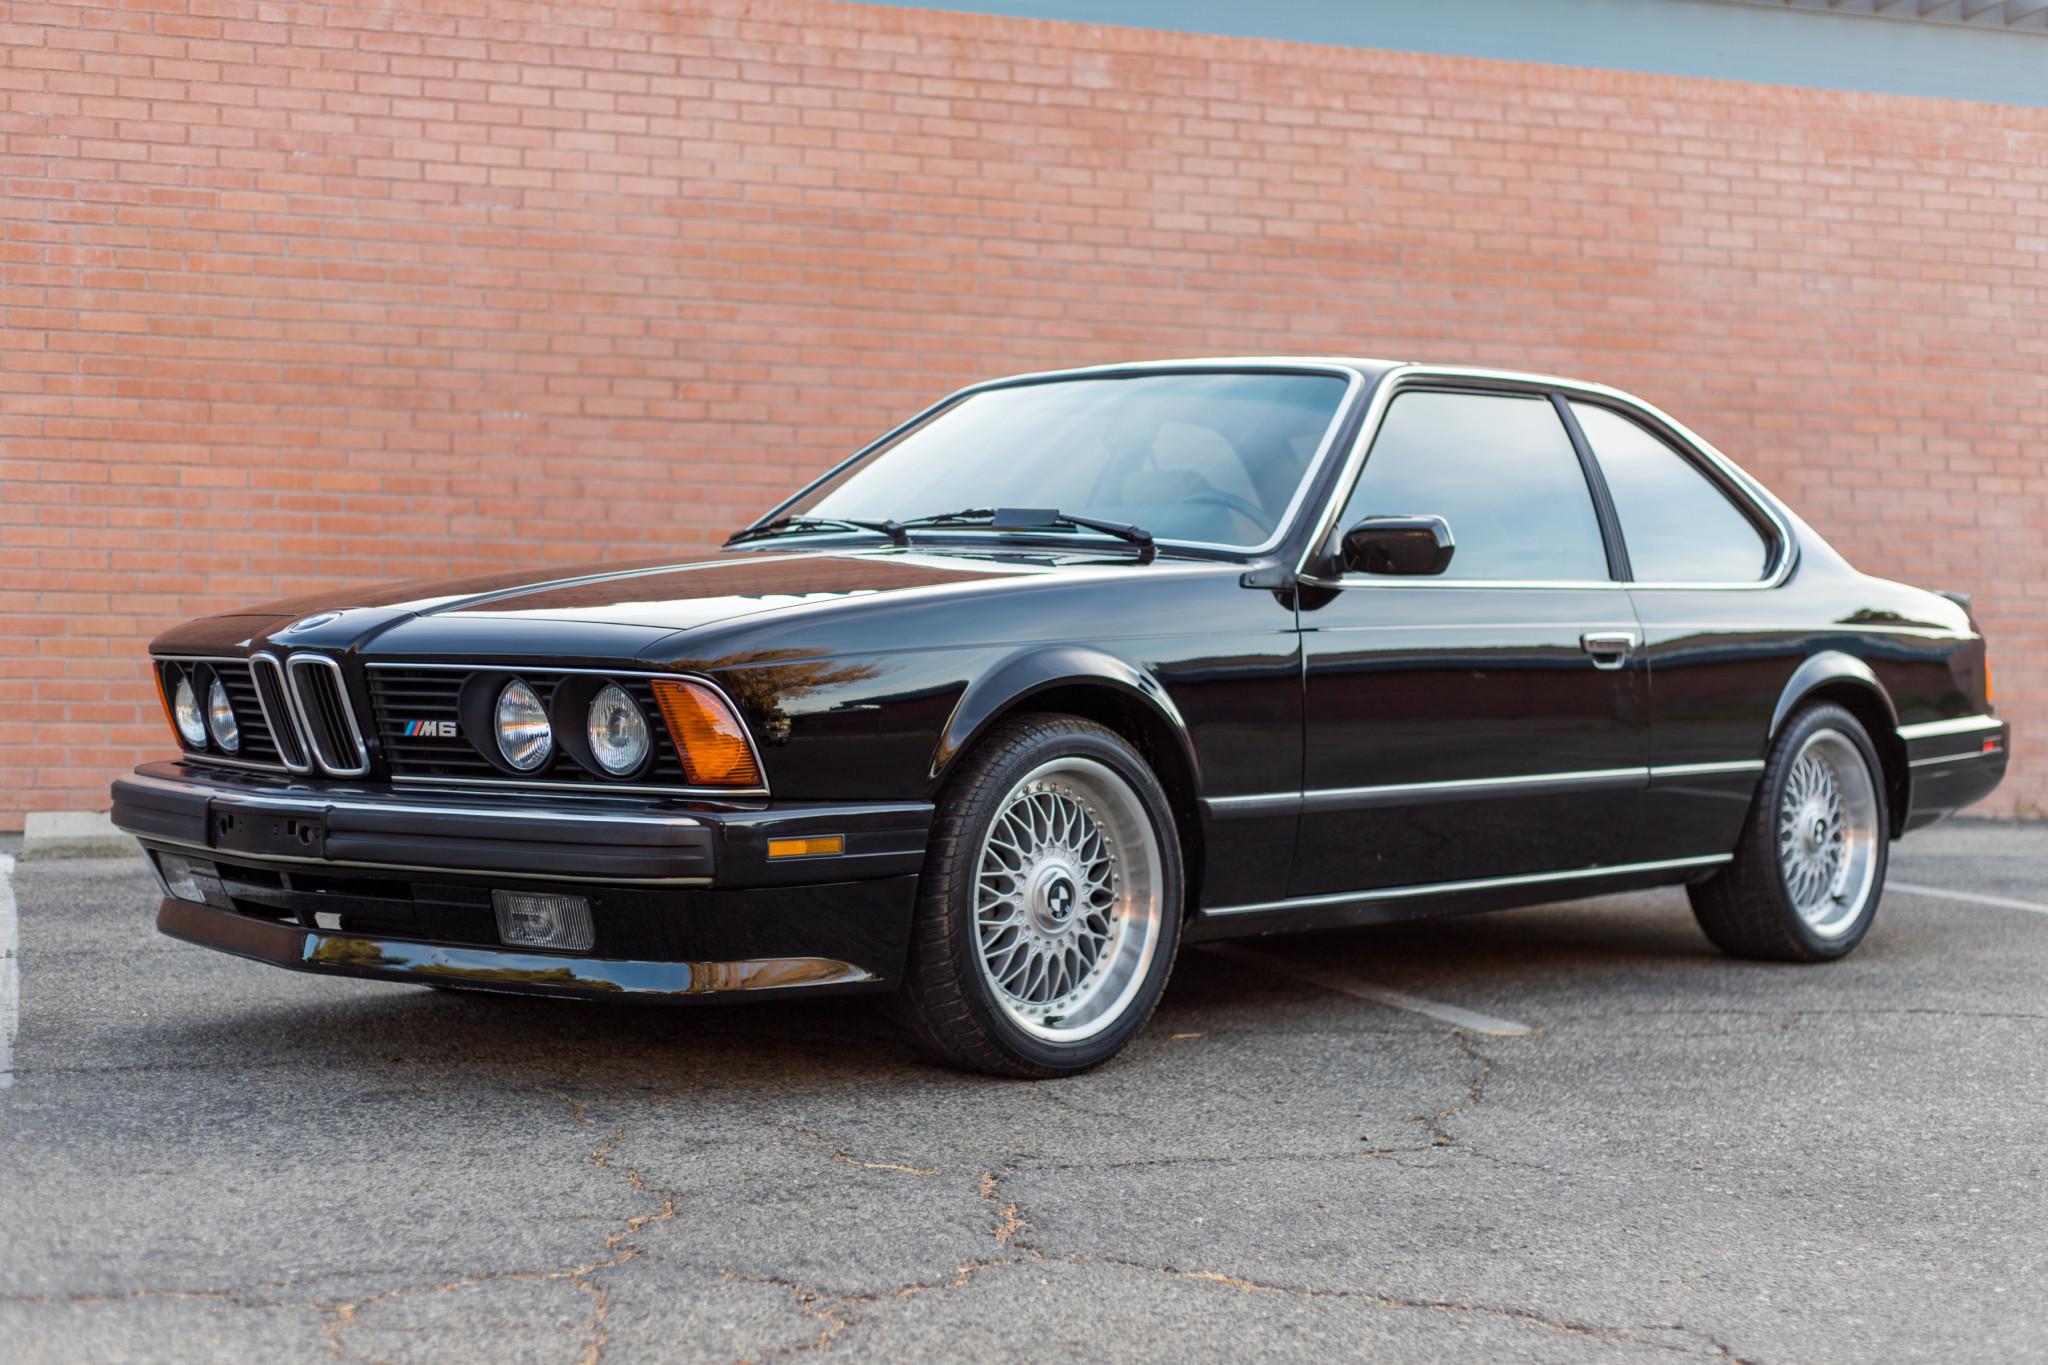 1988 bmw M6 kent classic cars (2).jpg